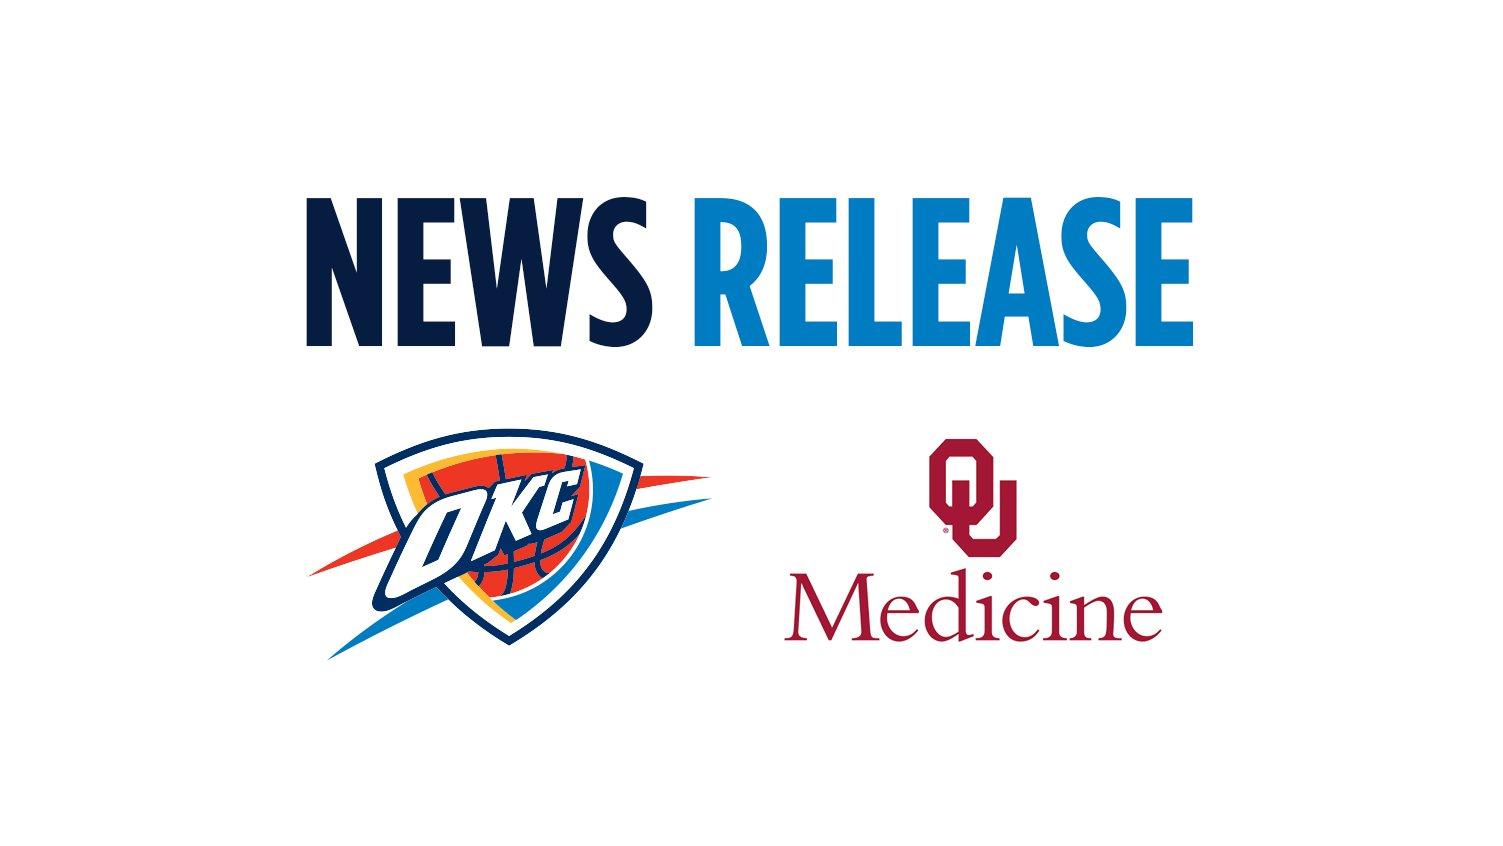 Oklahoma City Thunder, OU Medicine Announce Innovative New Partnership @OUMedicine  https://t.co/pagHQXPCbL https://t.co/4YRyhGgDn9